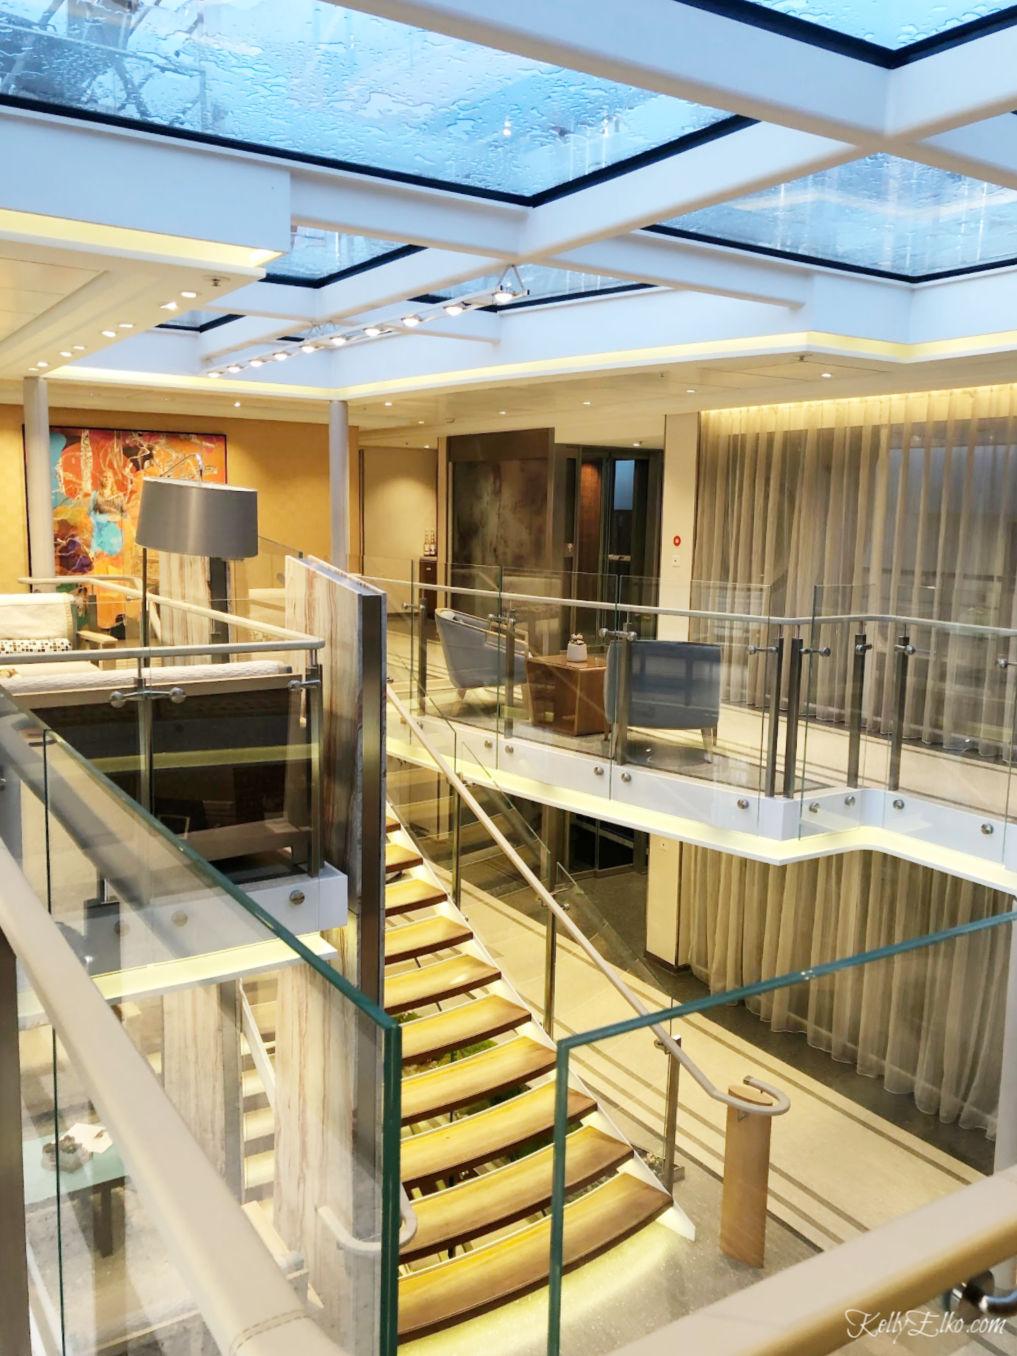 Viking River Cruise lobby - love the glass ceiling kellyelko.com #vikingrivercruise #vikingcruise #rivercruise